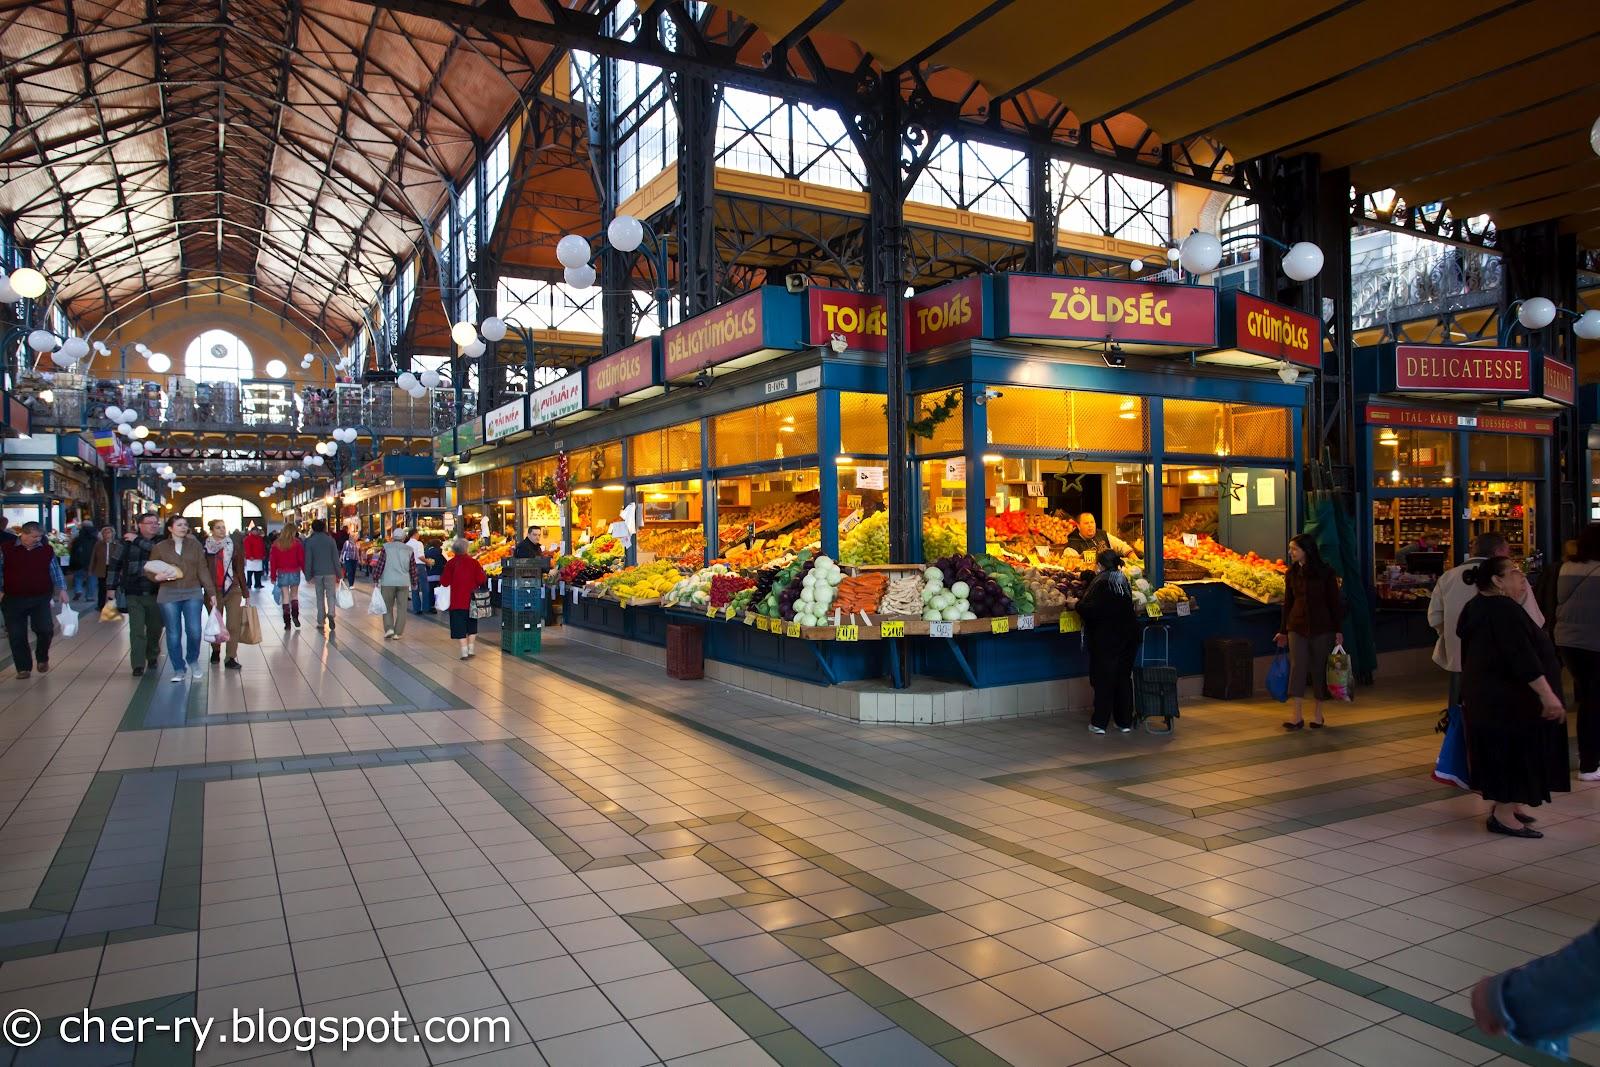 http://2.bp.blogspot.com/-FBHs5Uij3qE/T4GYGszfYGI/AAAAAAAAj-I/pIoiNm5CE98/s1600/Budapest+Great+Market+Hall-21.jpg